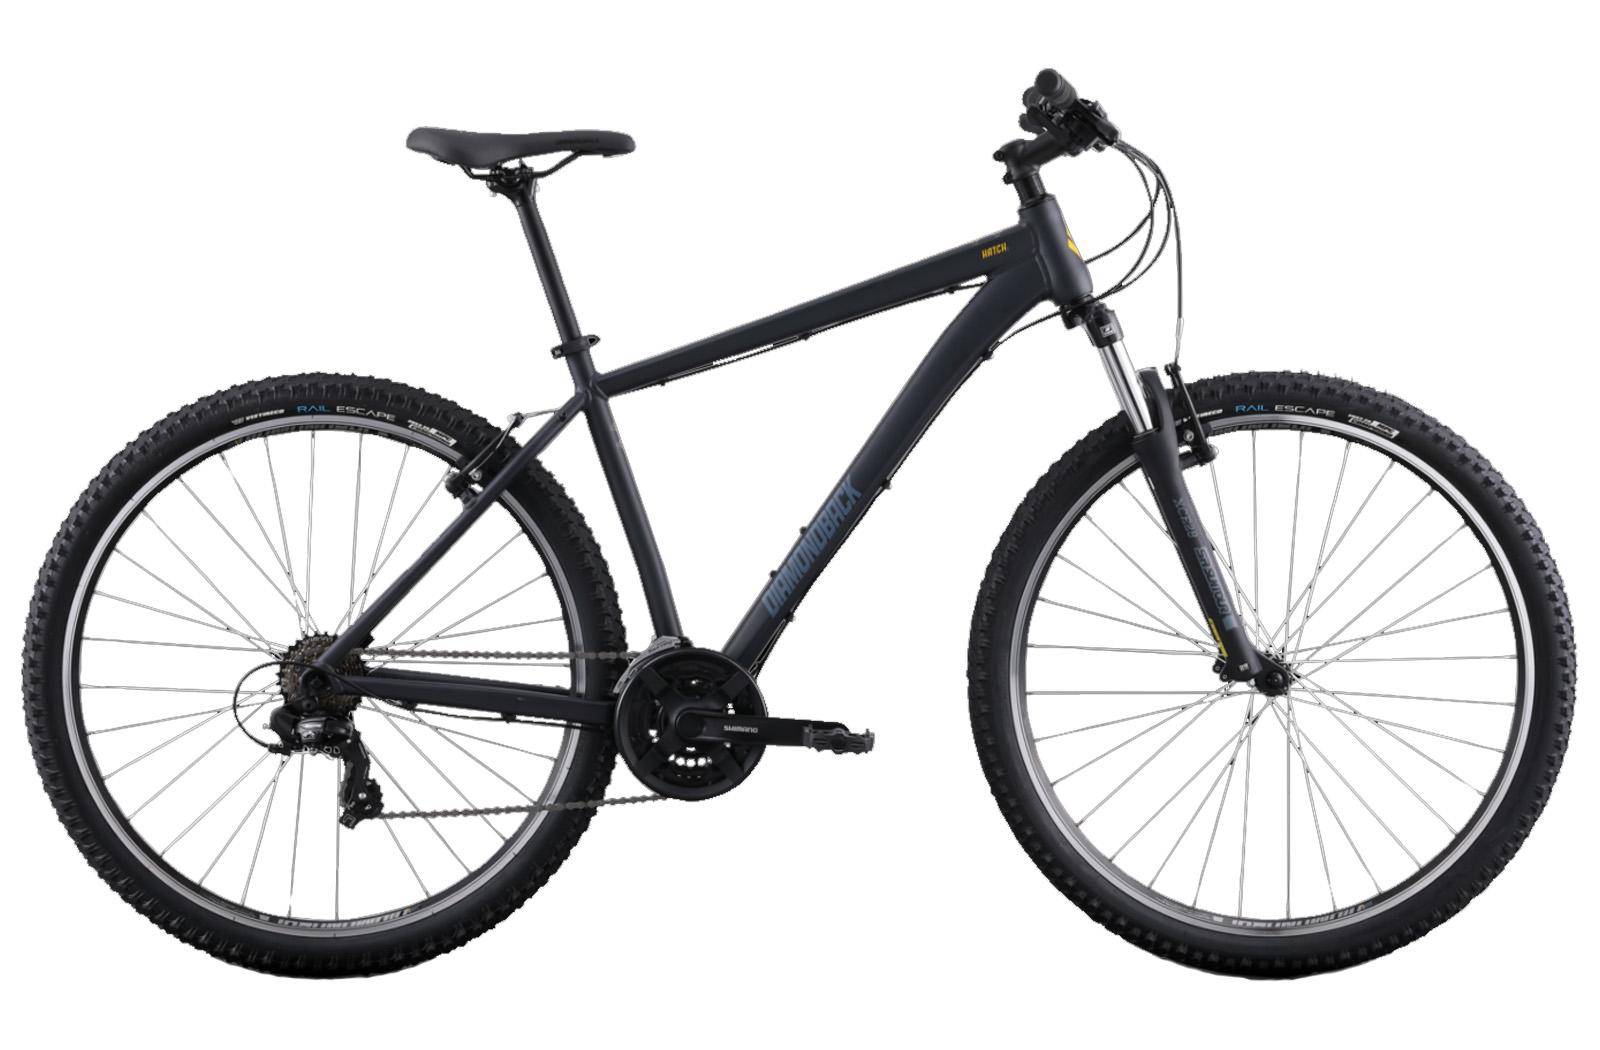 Tilgængelig nu: Diamondback Hatch 1 Mountain Bike & SILCA HX-One Toolkit